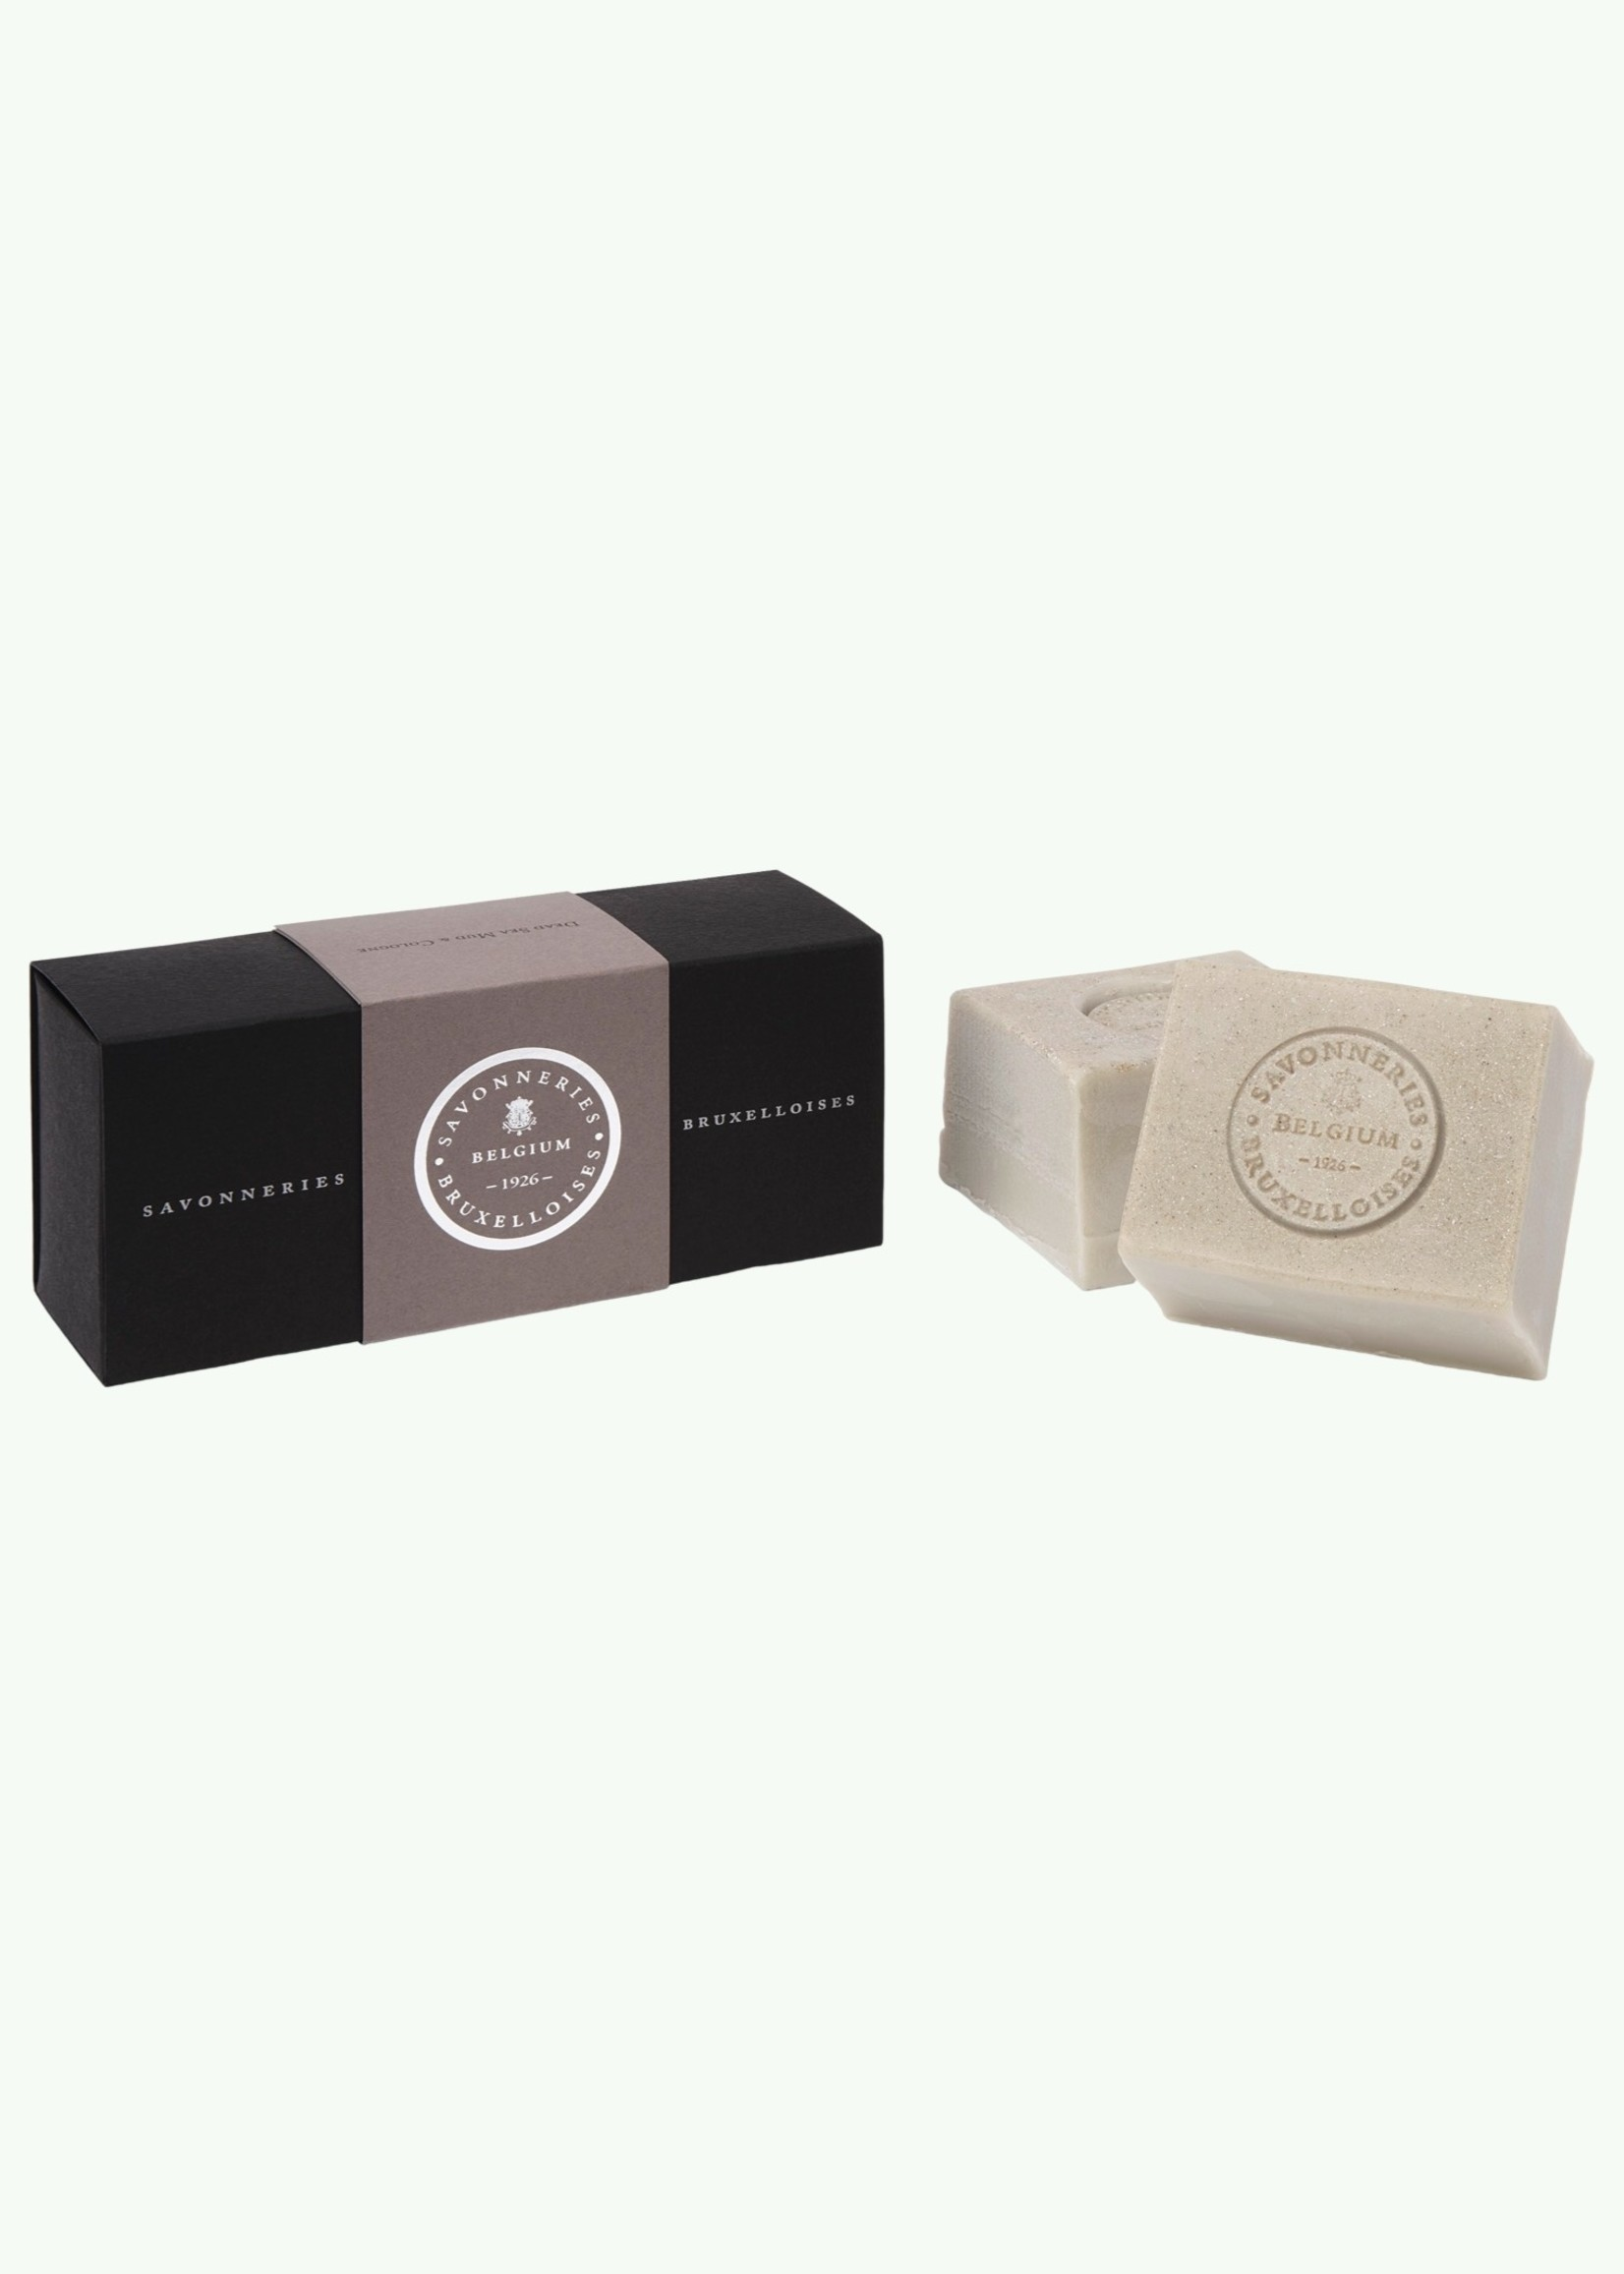 Savonneries Bruxelloises Savonneries Bruxelloises - Dead Sea Mud - Glycerine soap - 2 x 200 gr